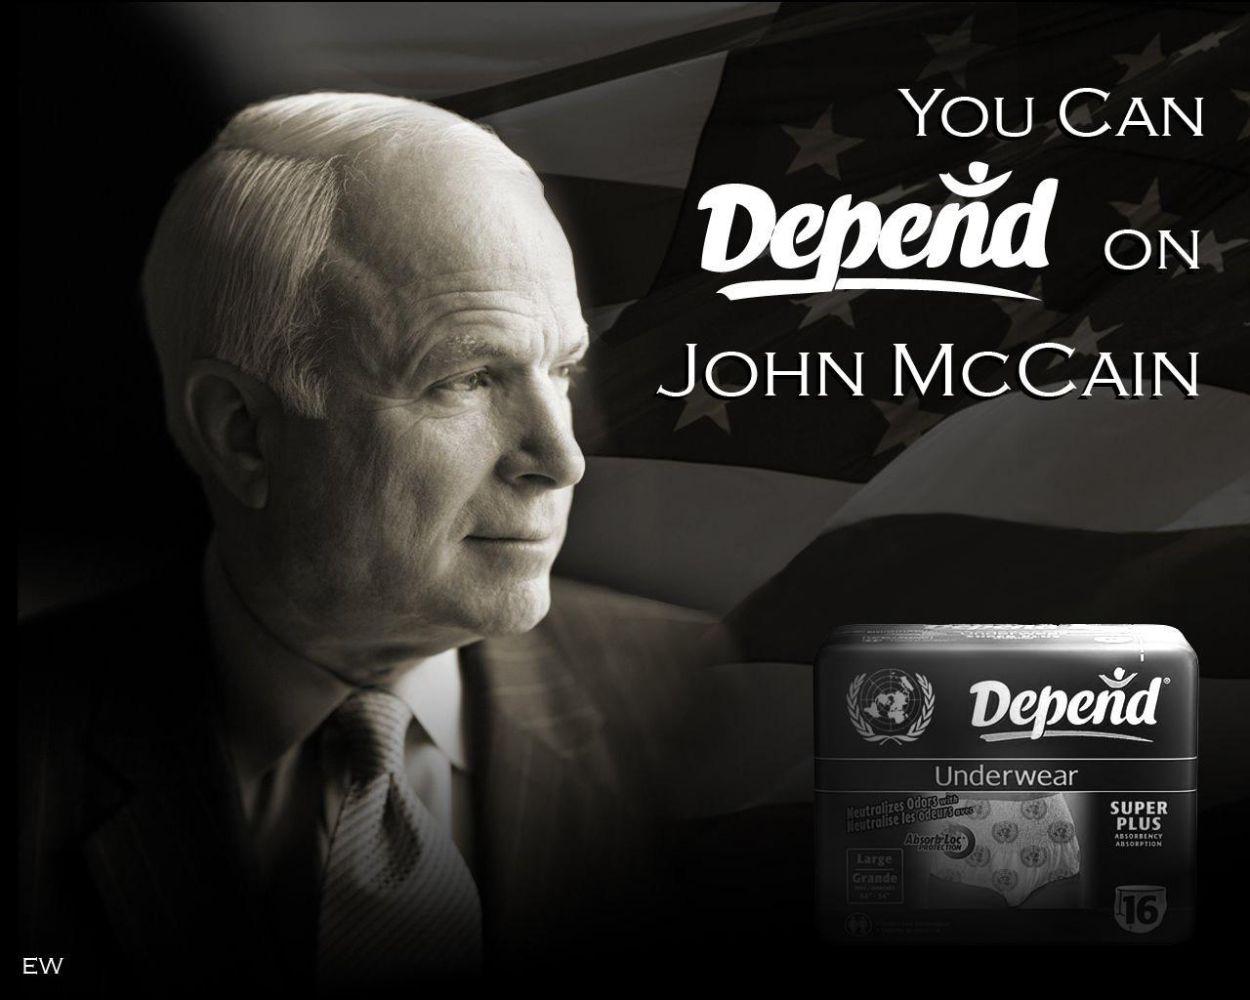 Depend on John McCain